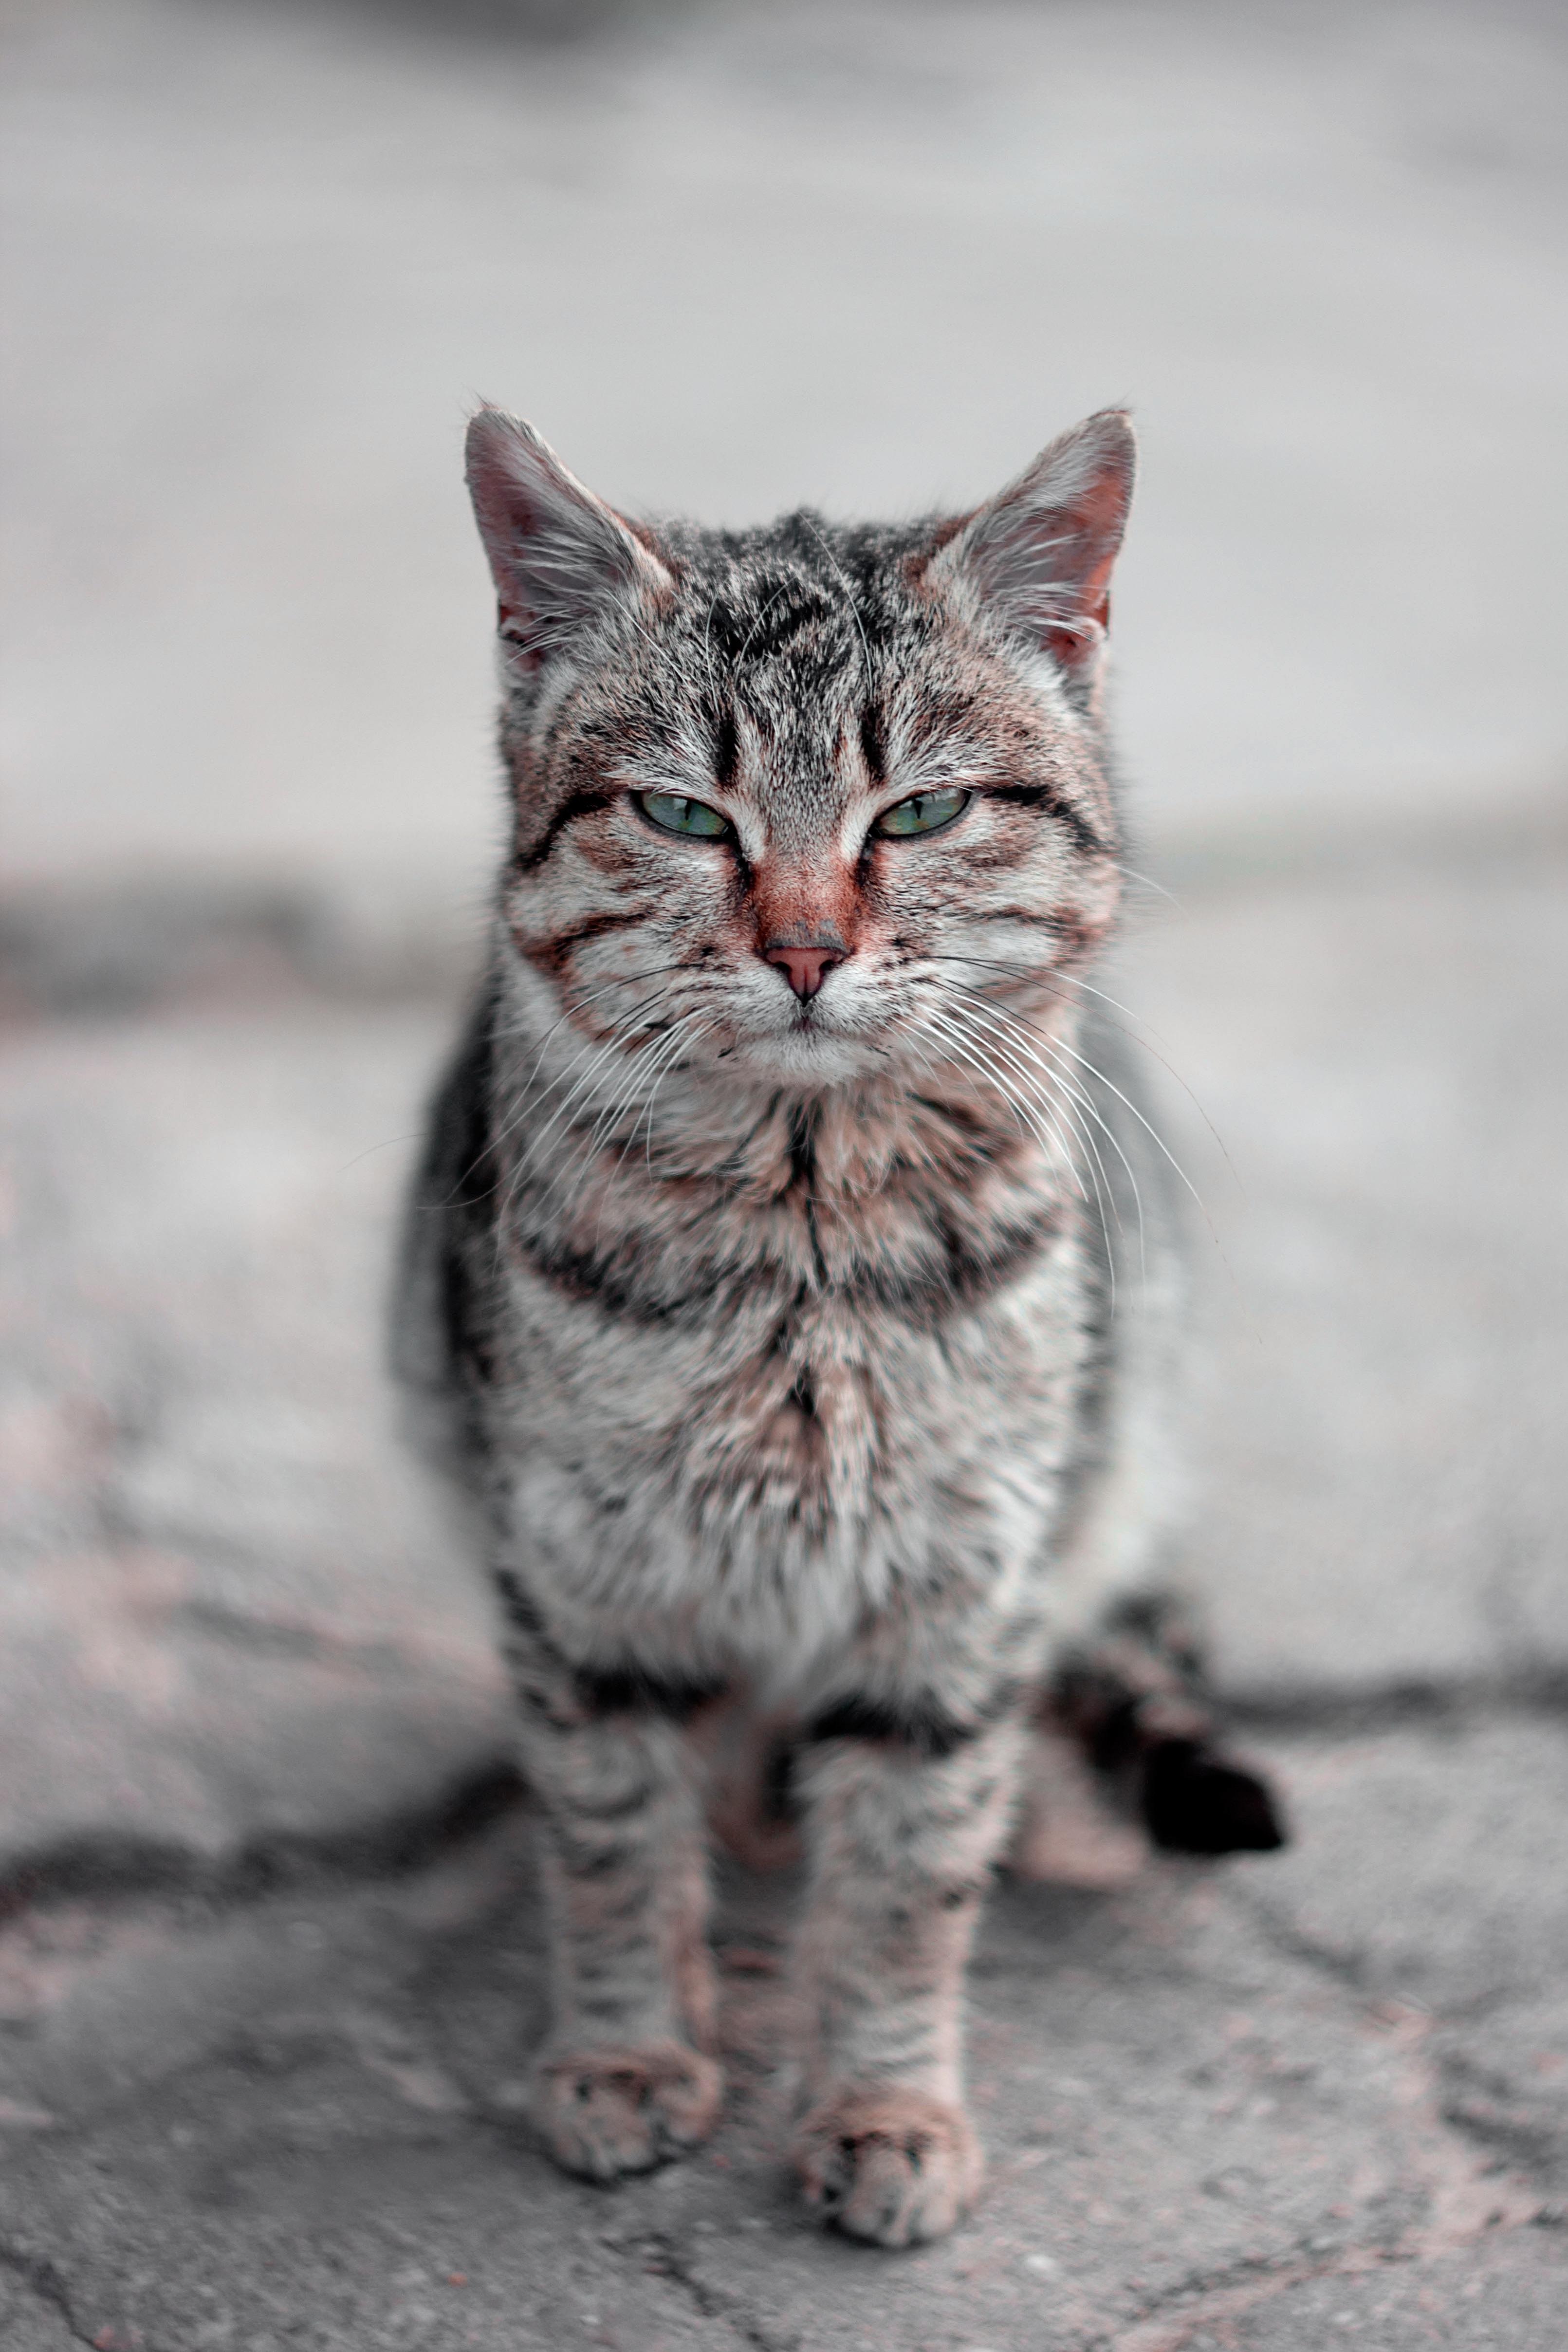 Free kitten fauna whiskers vertebrate tabby cat